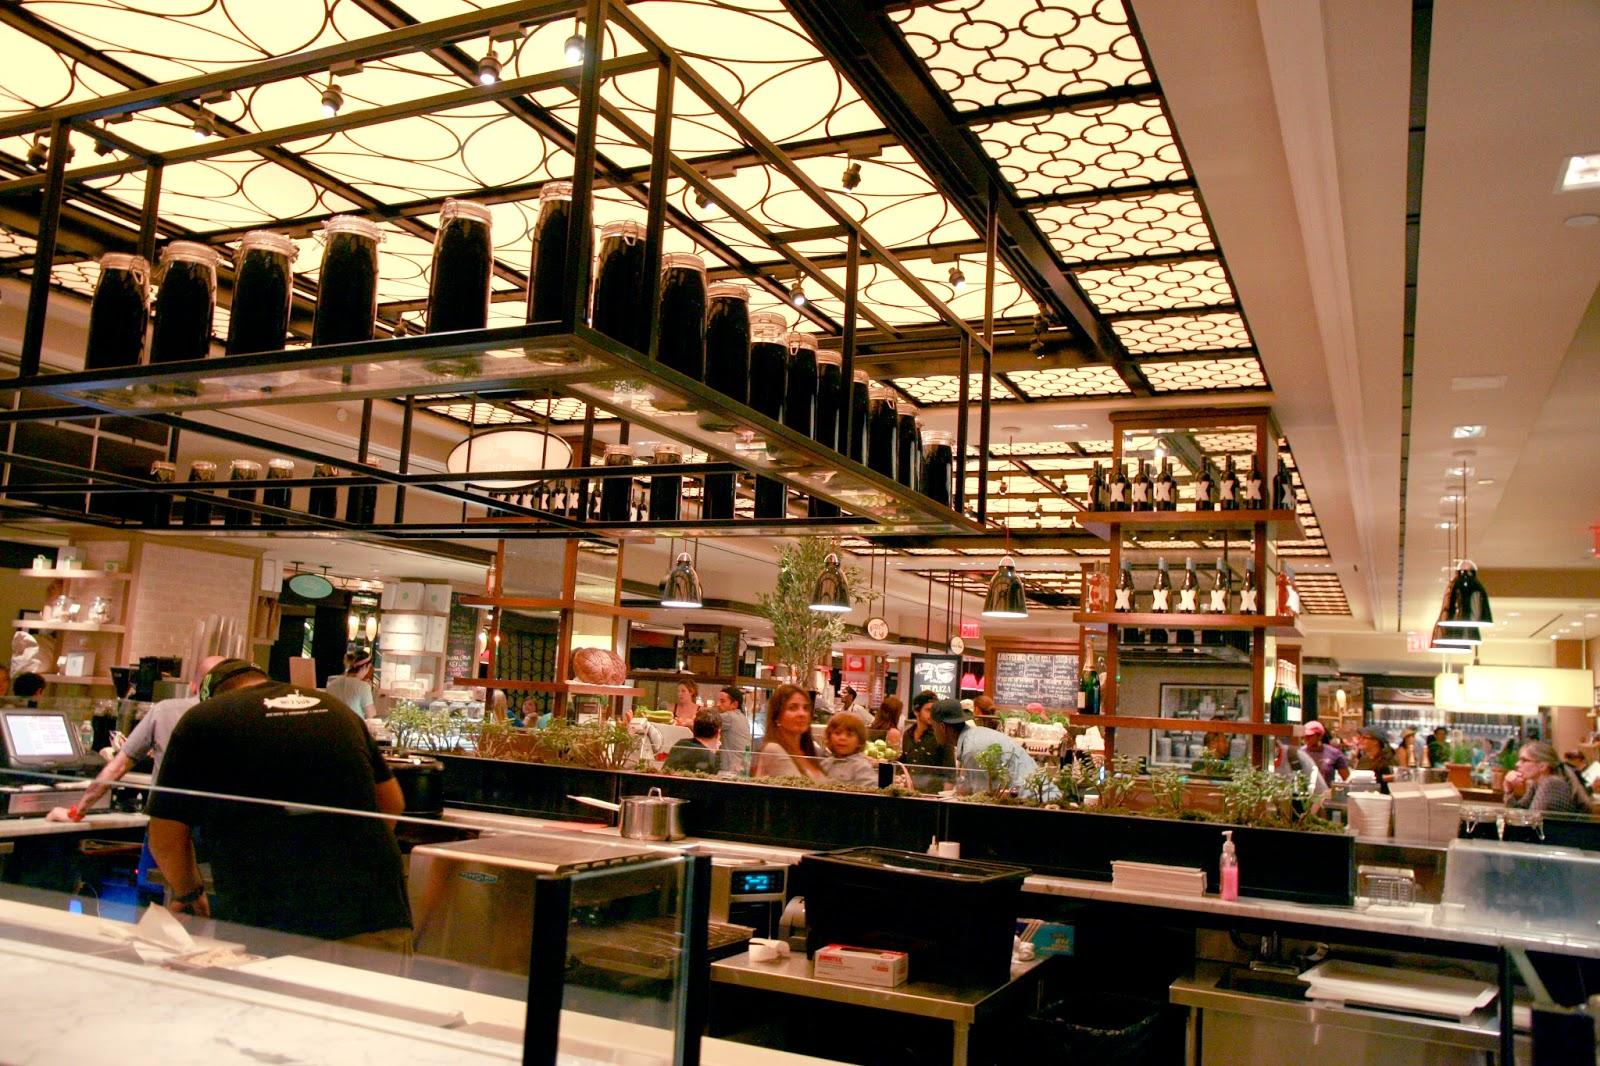 Sartorial Diner: Eats in New York : Plaza Food Hall